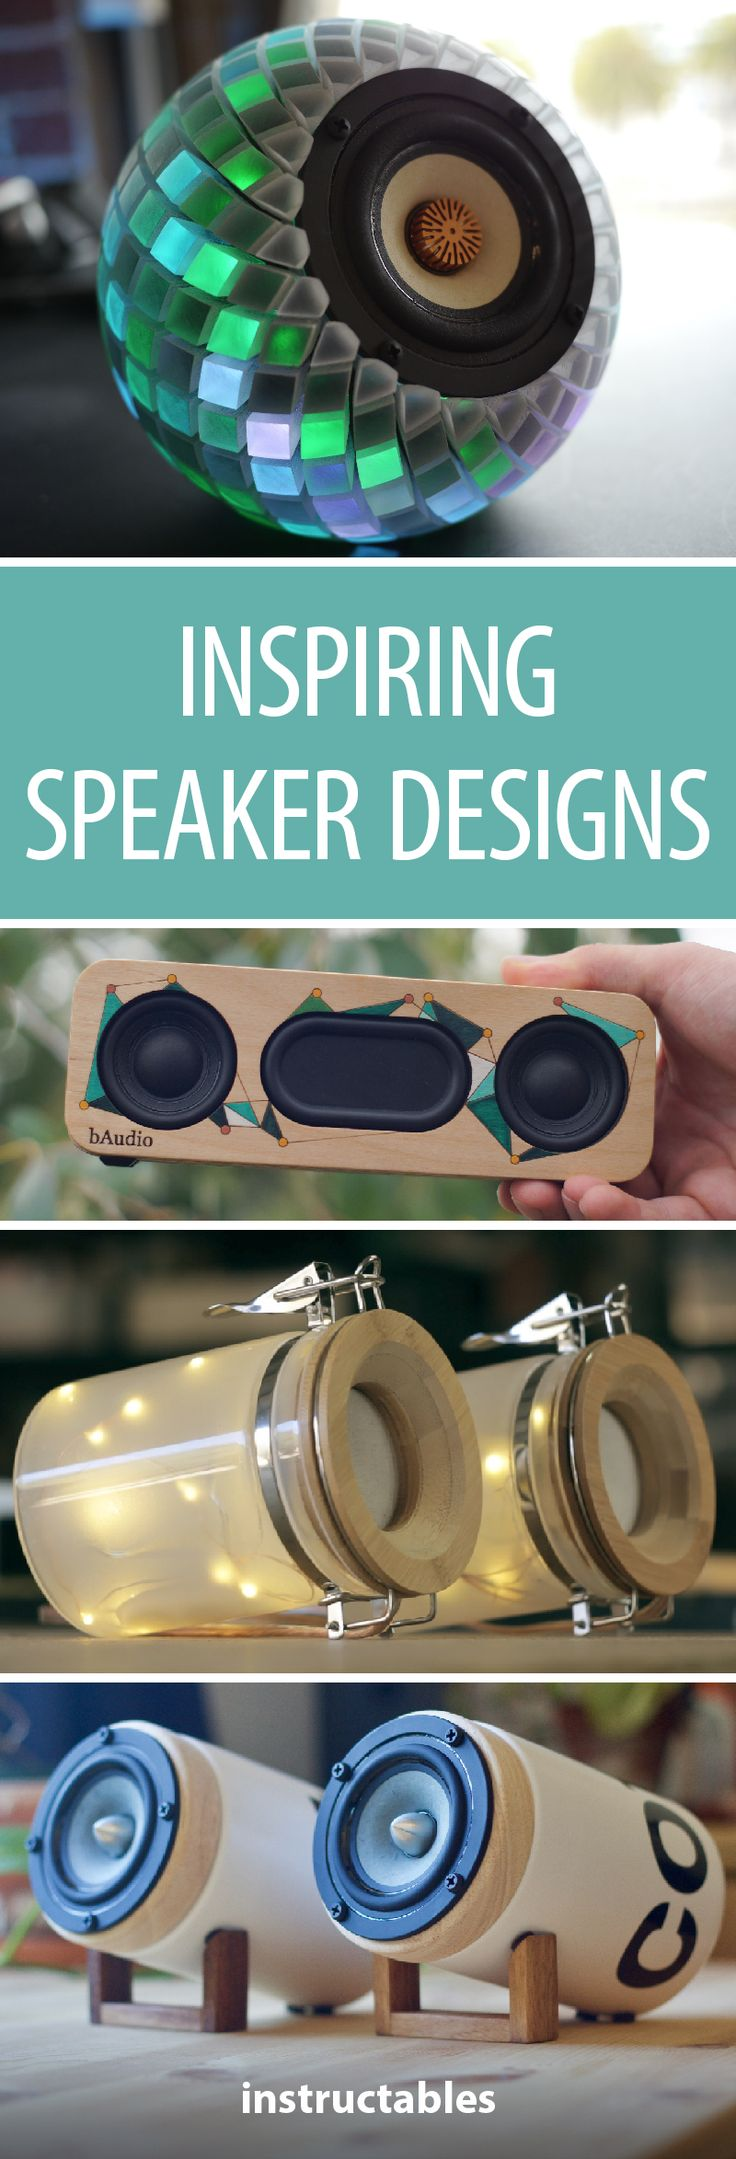 Inspiring Speaker Projects